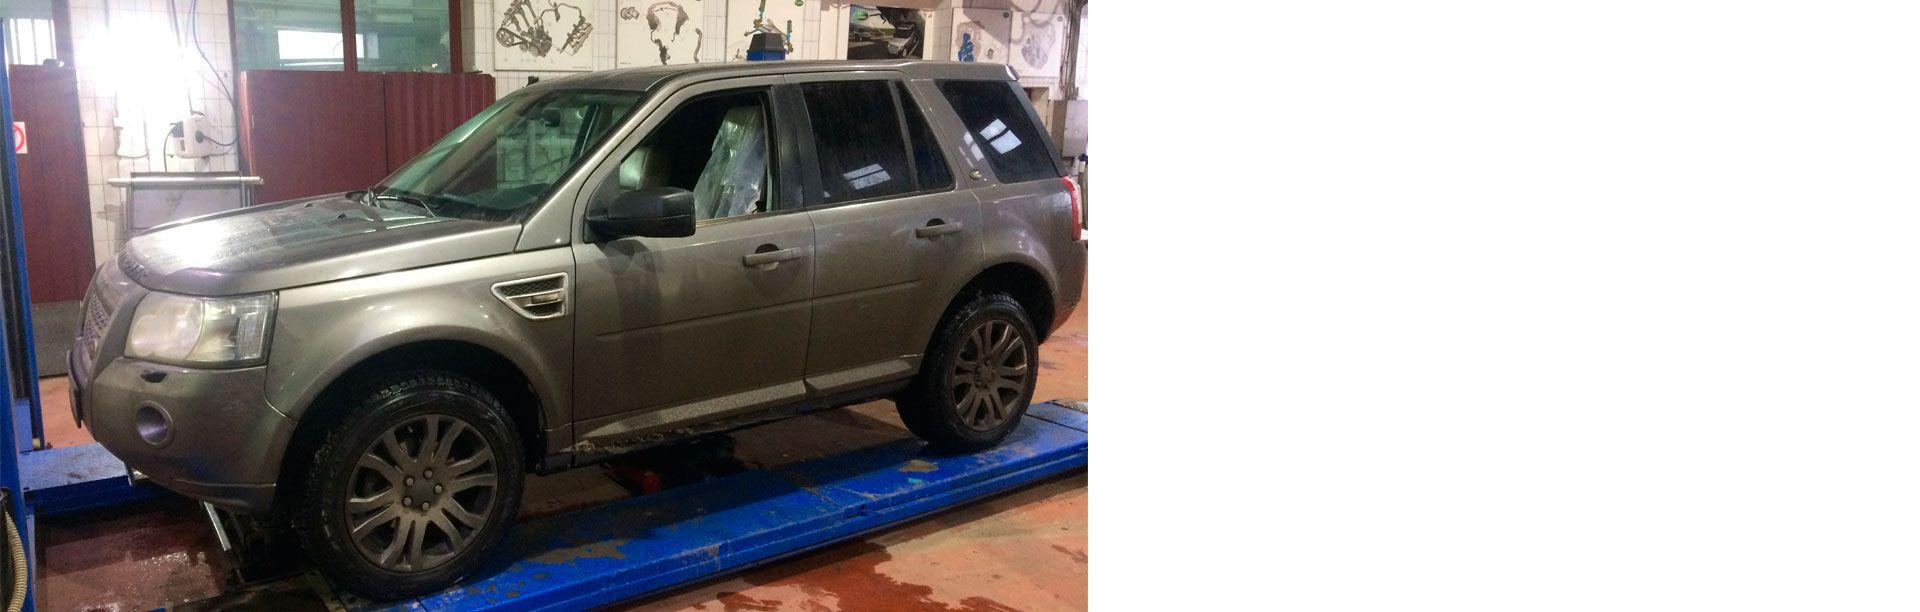 Магазин запчастей Land Rover LR-West